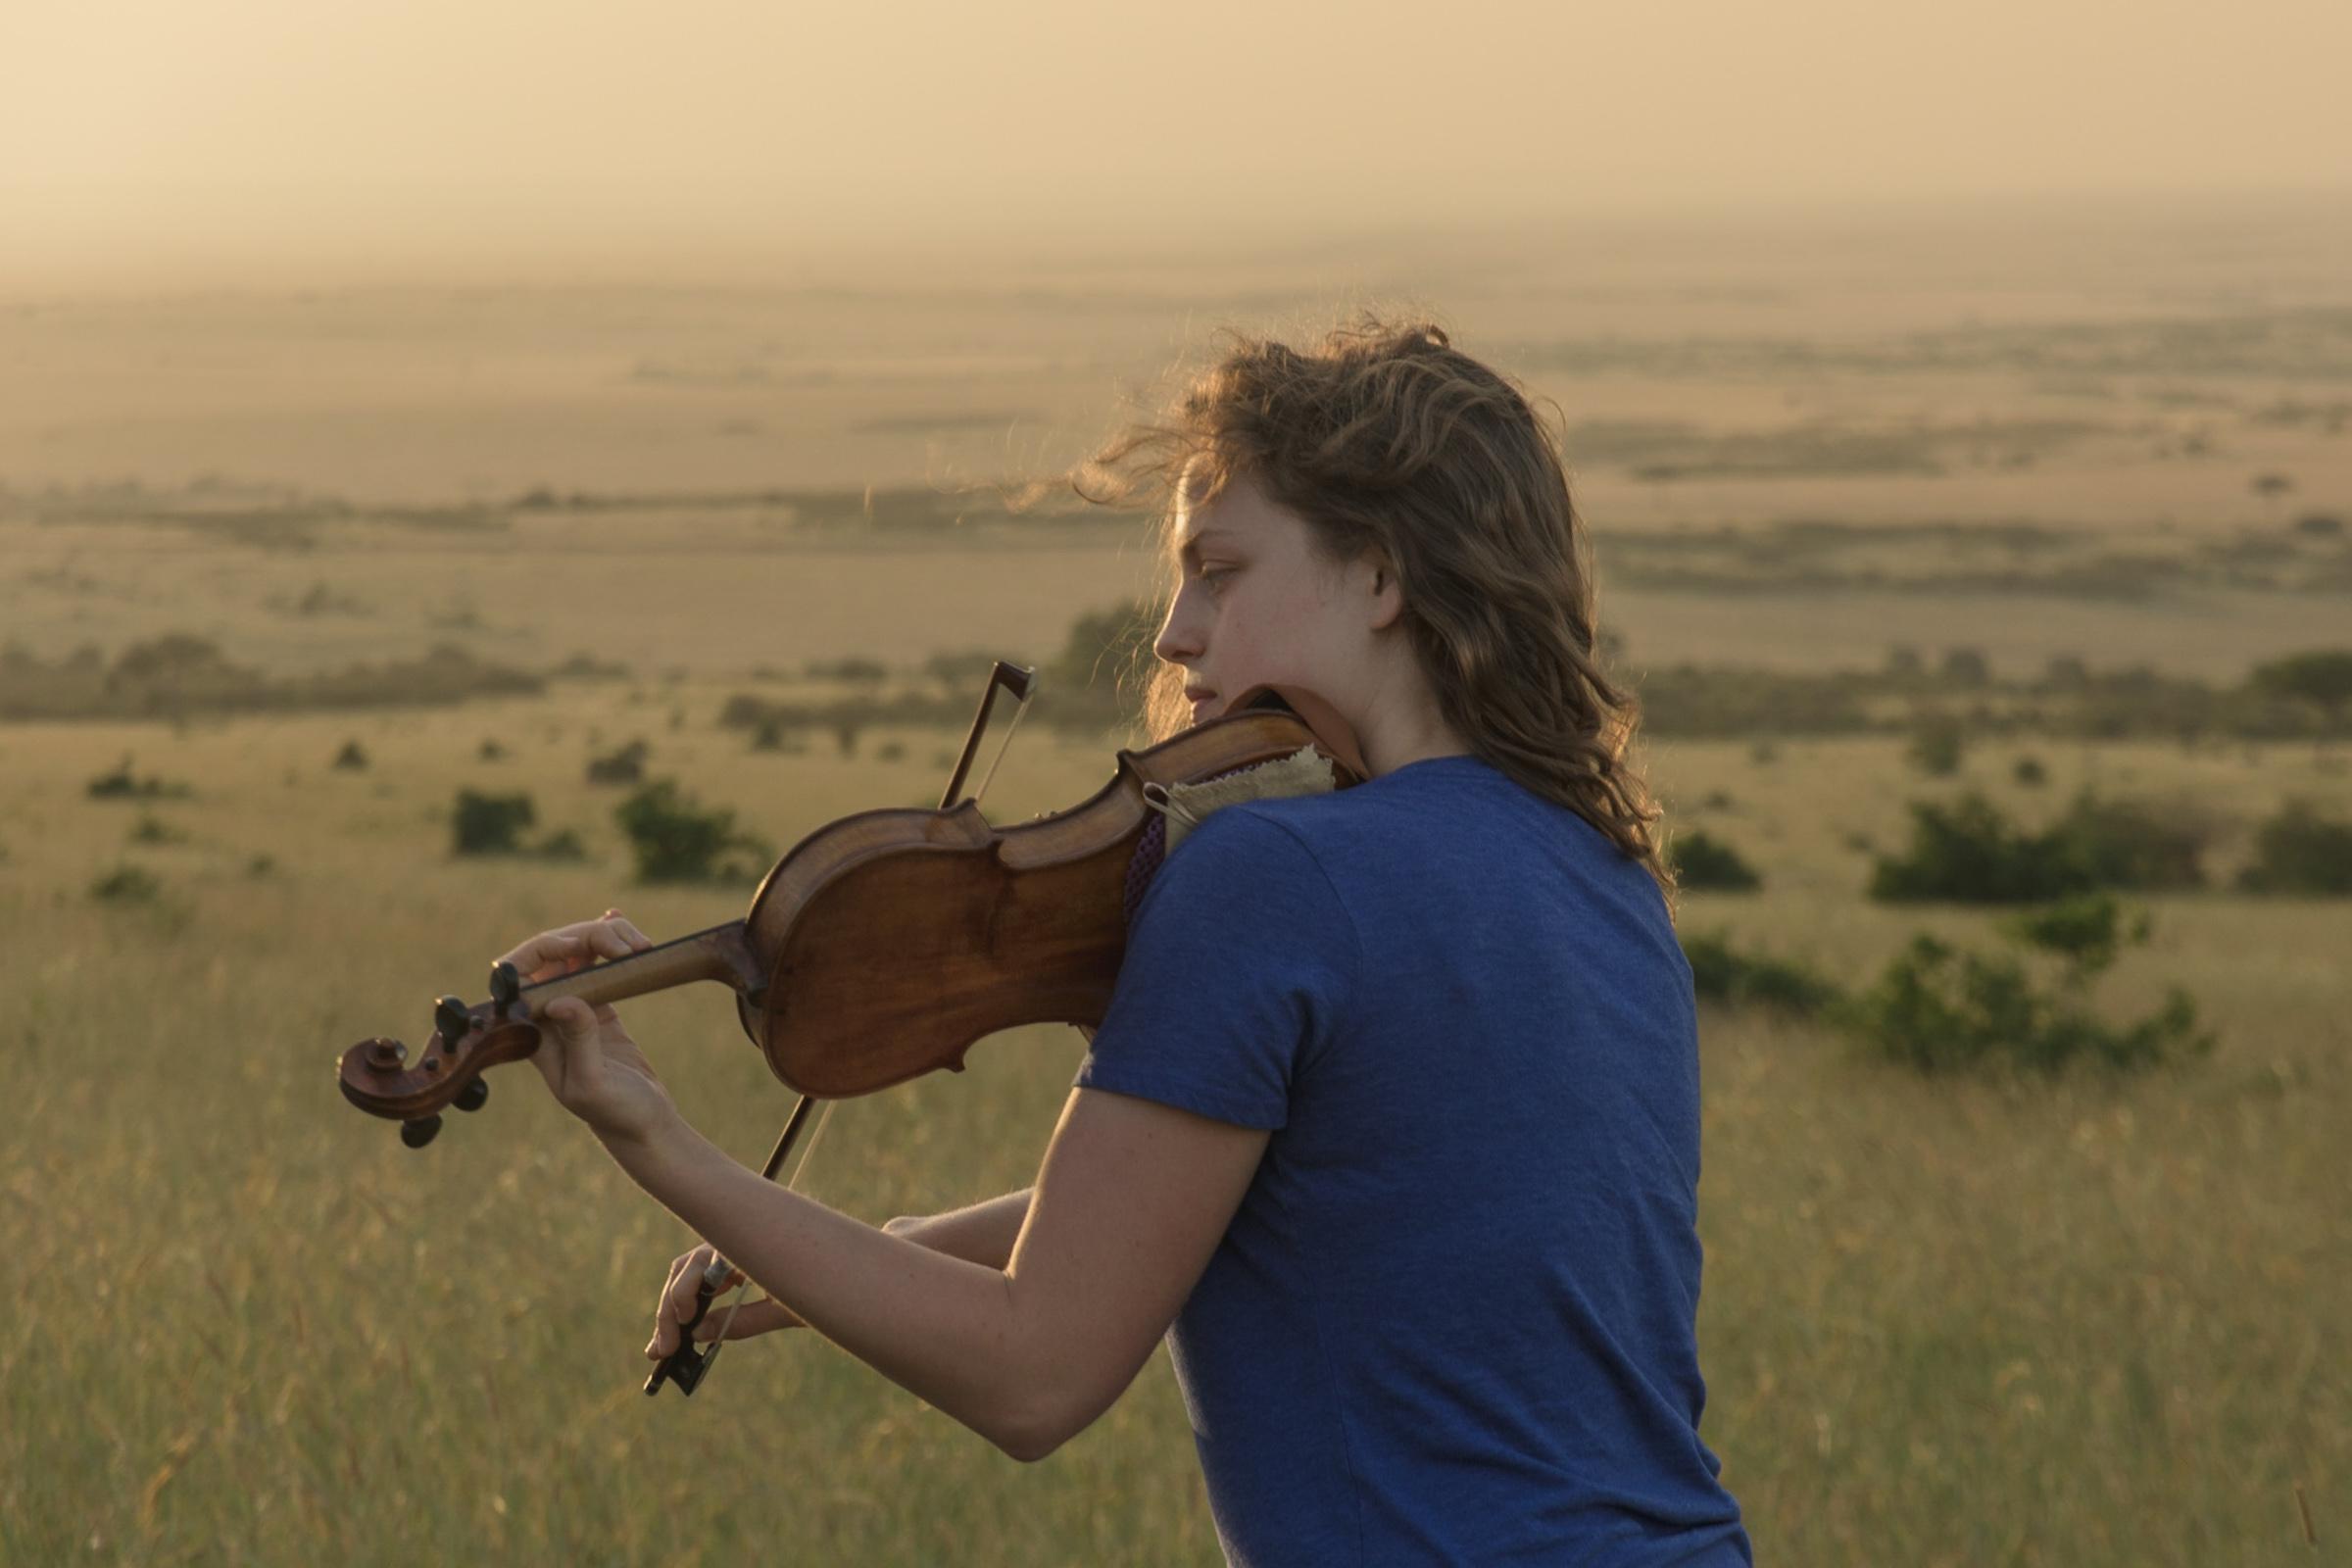 female playing violin at sunset in Masai mara reserve